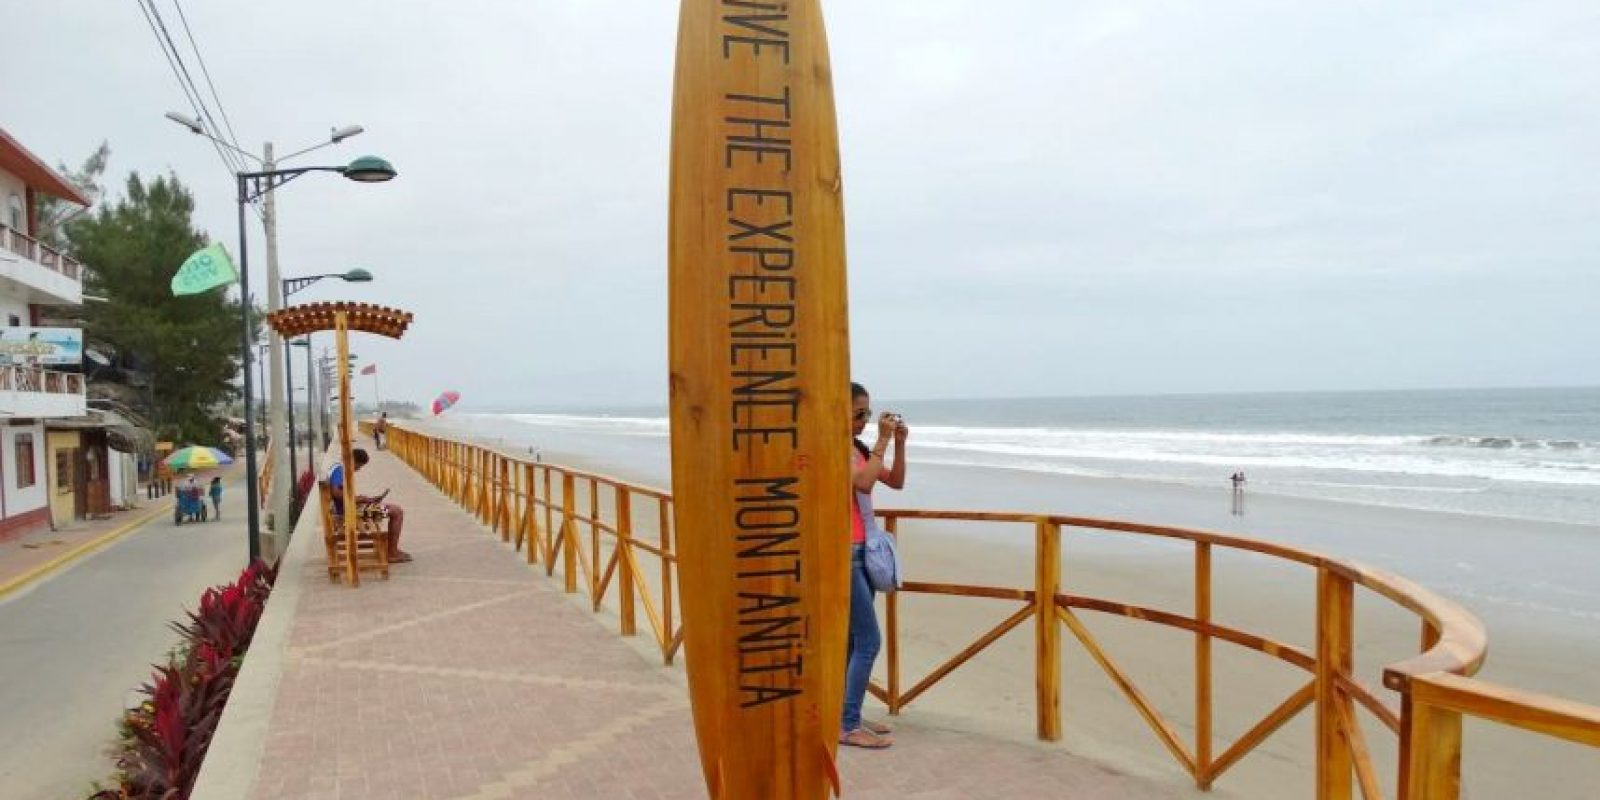 Montañita Foto:Flickr.com